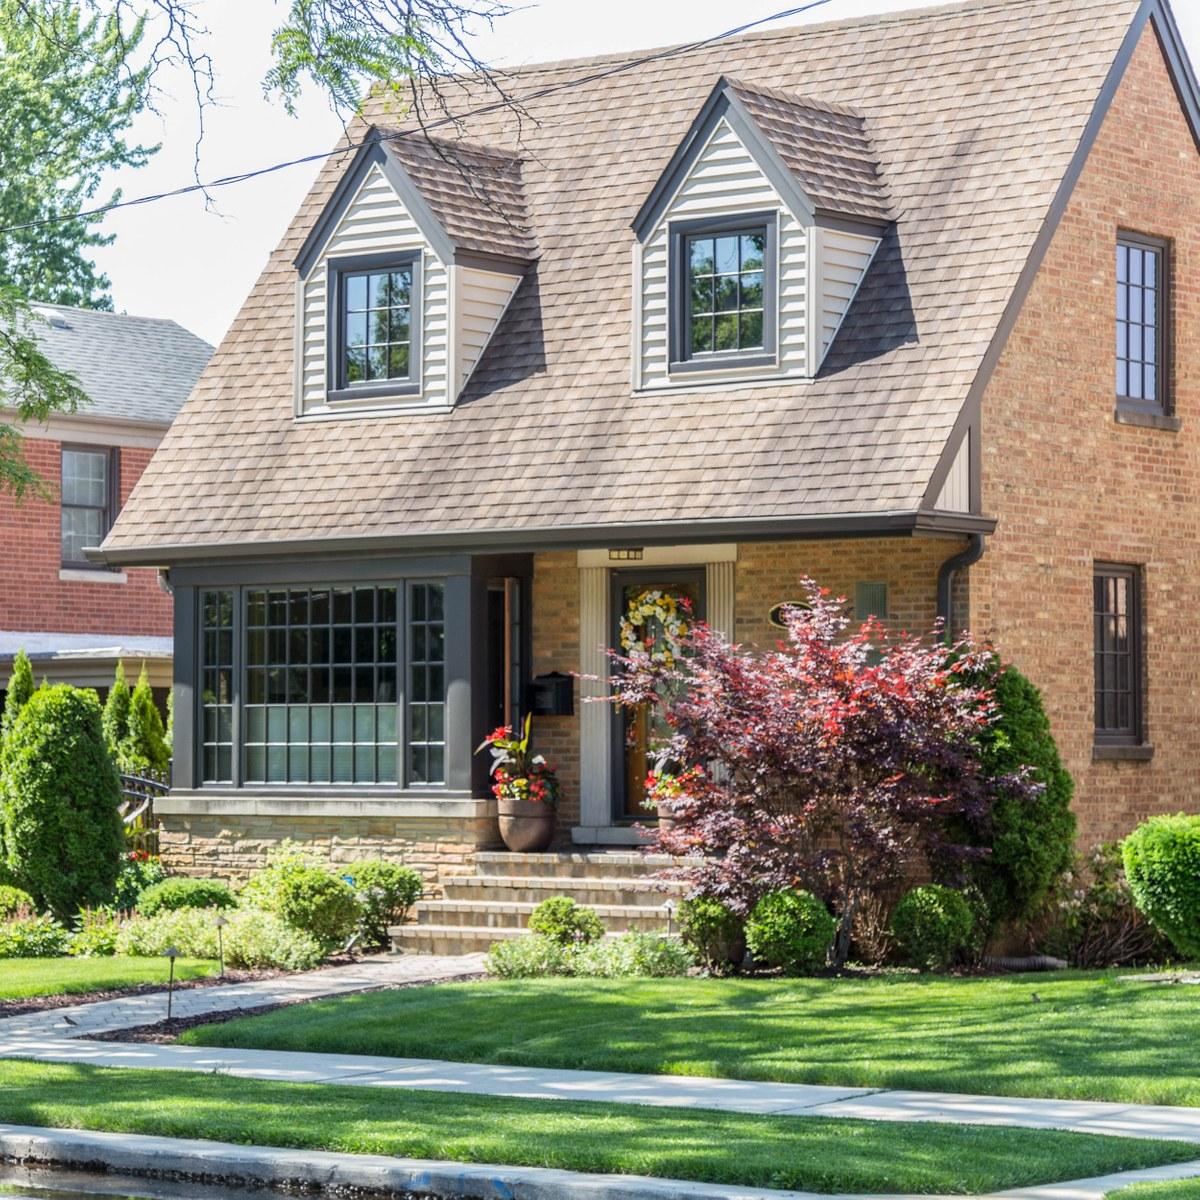 Edgebrook Apartments: Edgebrook, Chicago IL - Neighborhood Guide